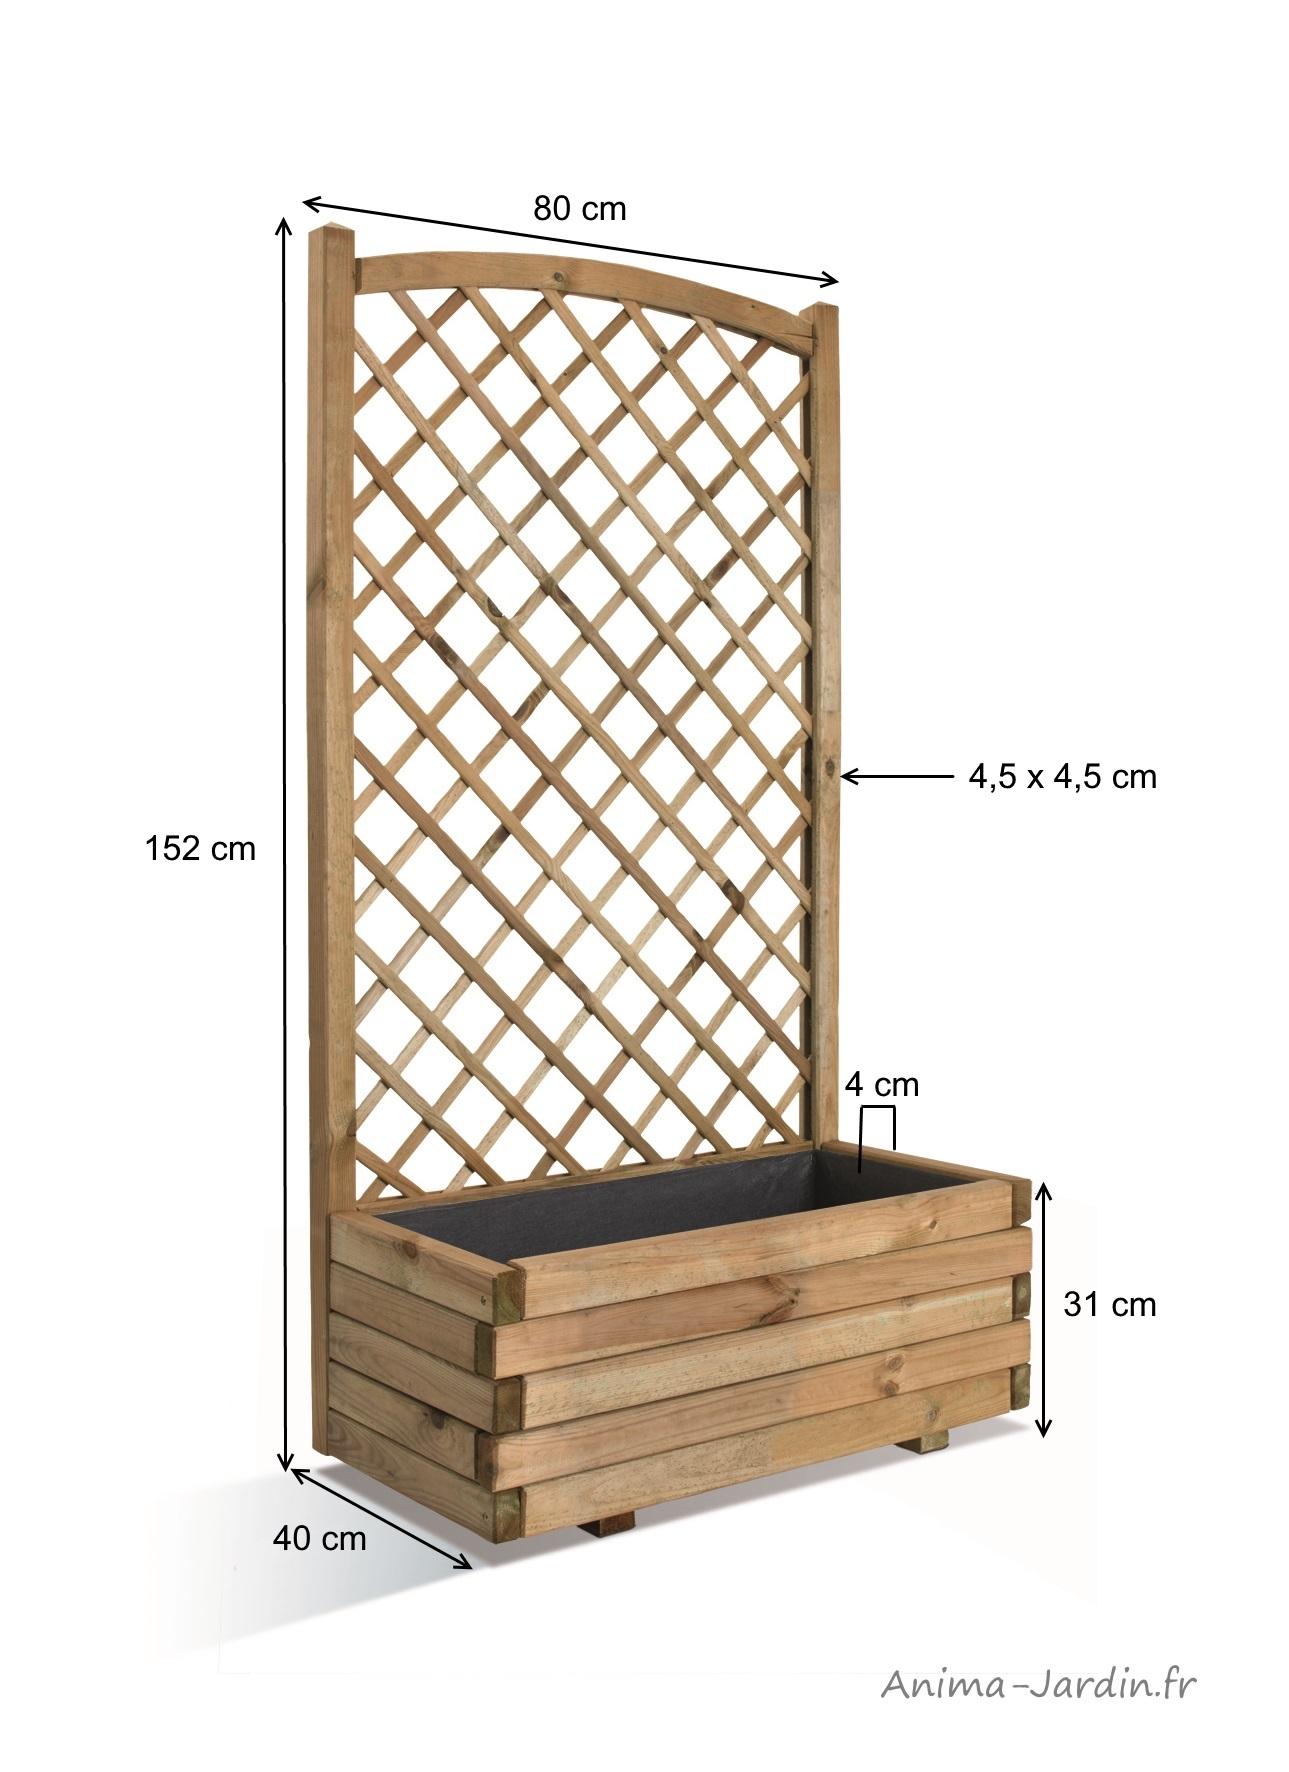 bac-treillis-plante-grimpante-dimensions-anima-jardin.fr